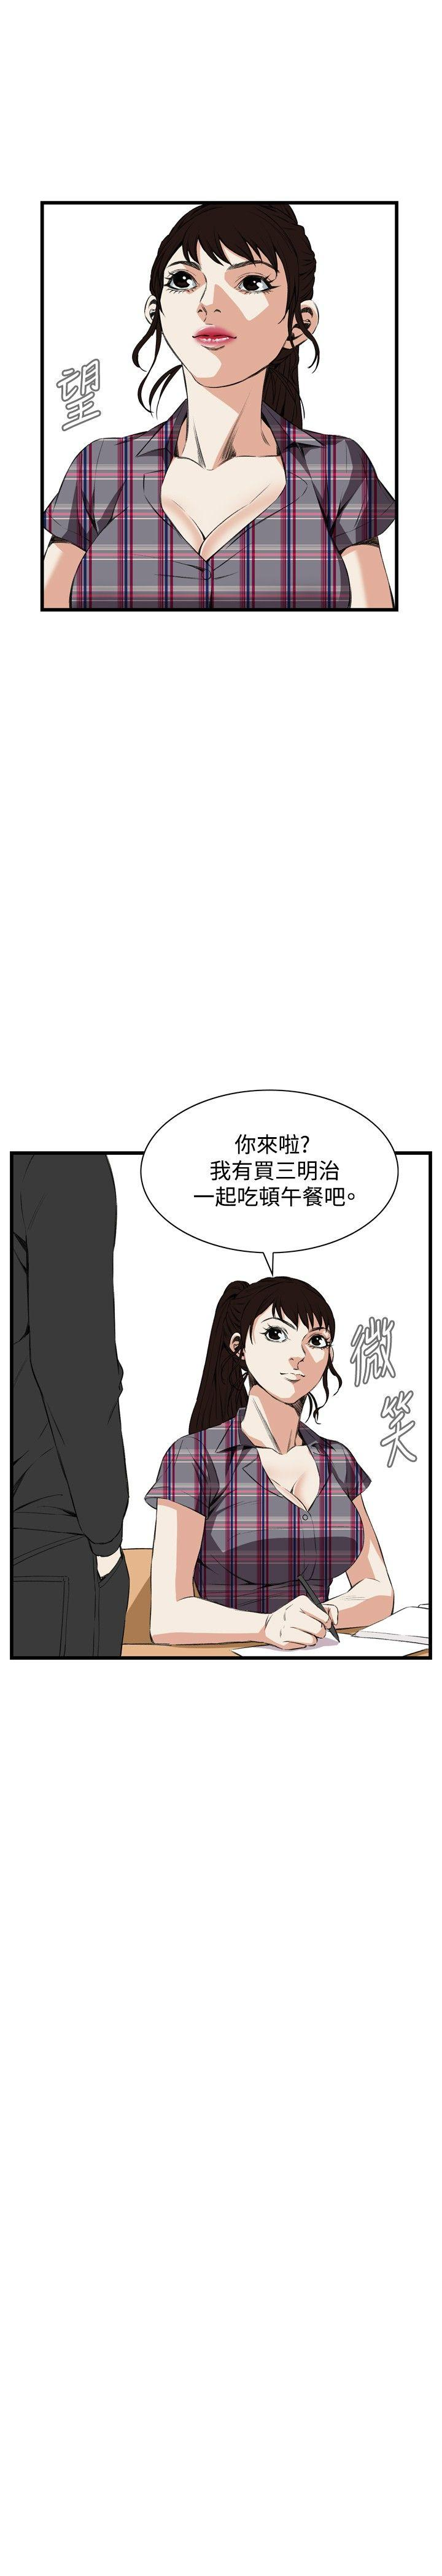 Take a Peek 偷窥 Ch.39~55 [Chinese]中文 516